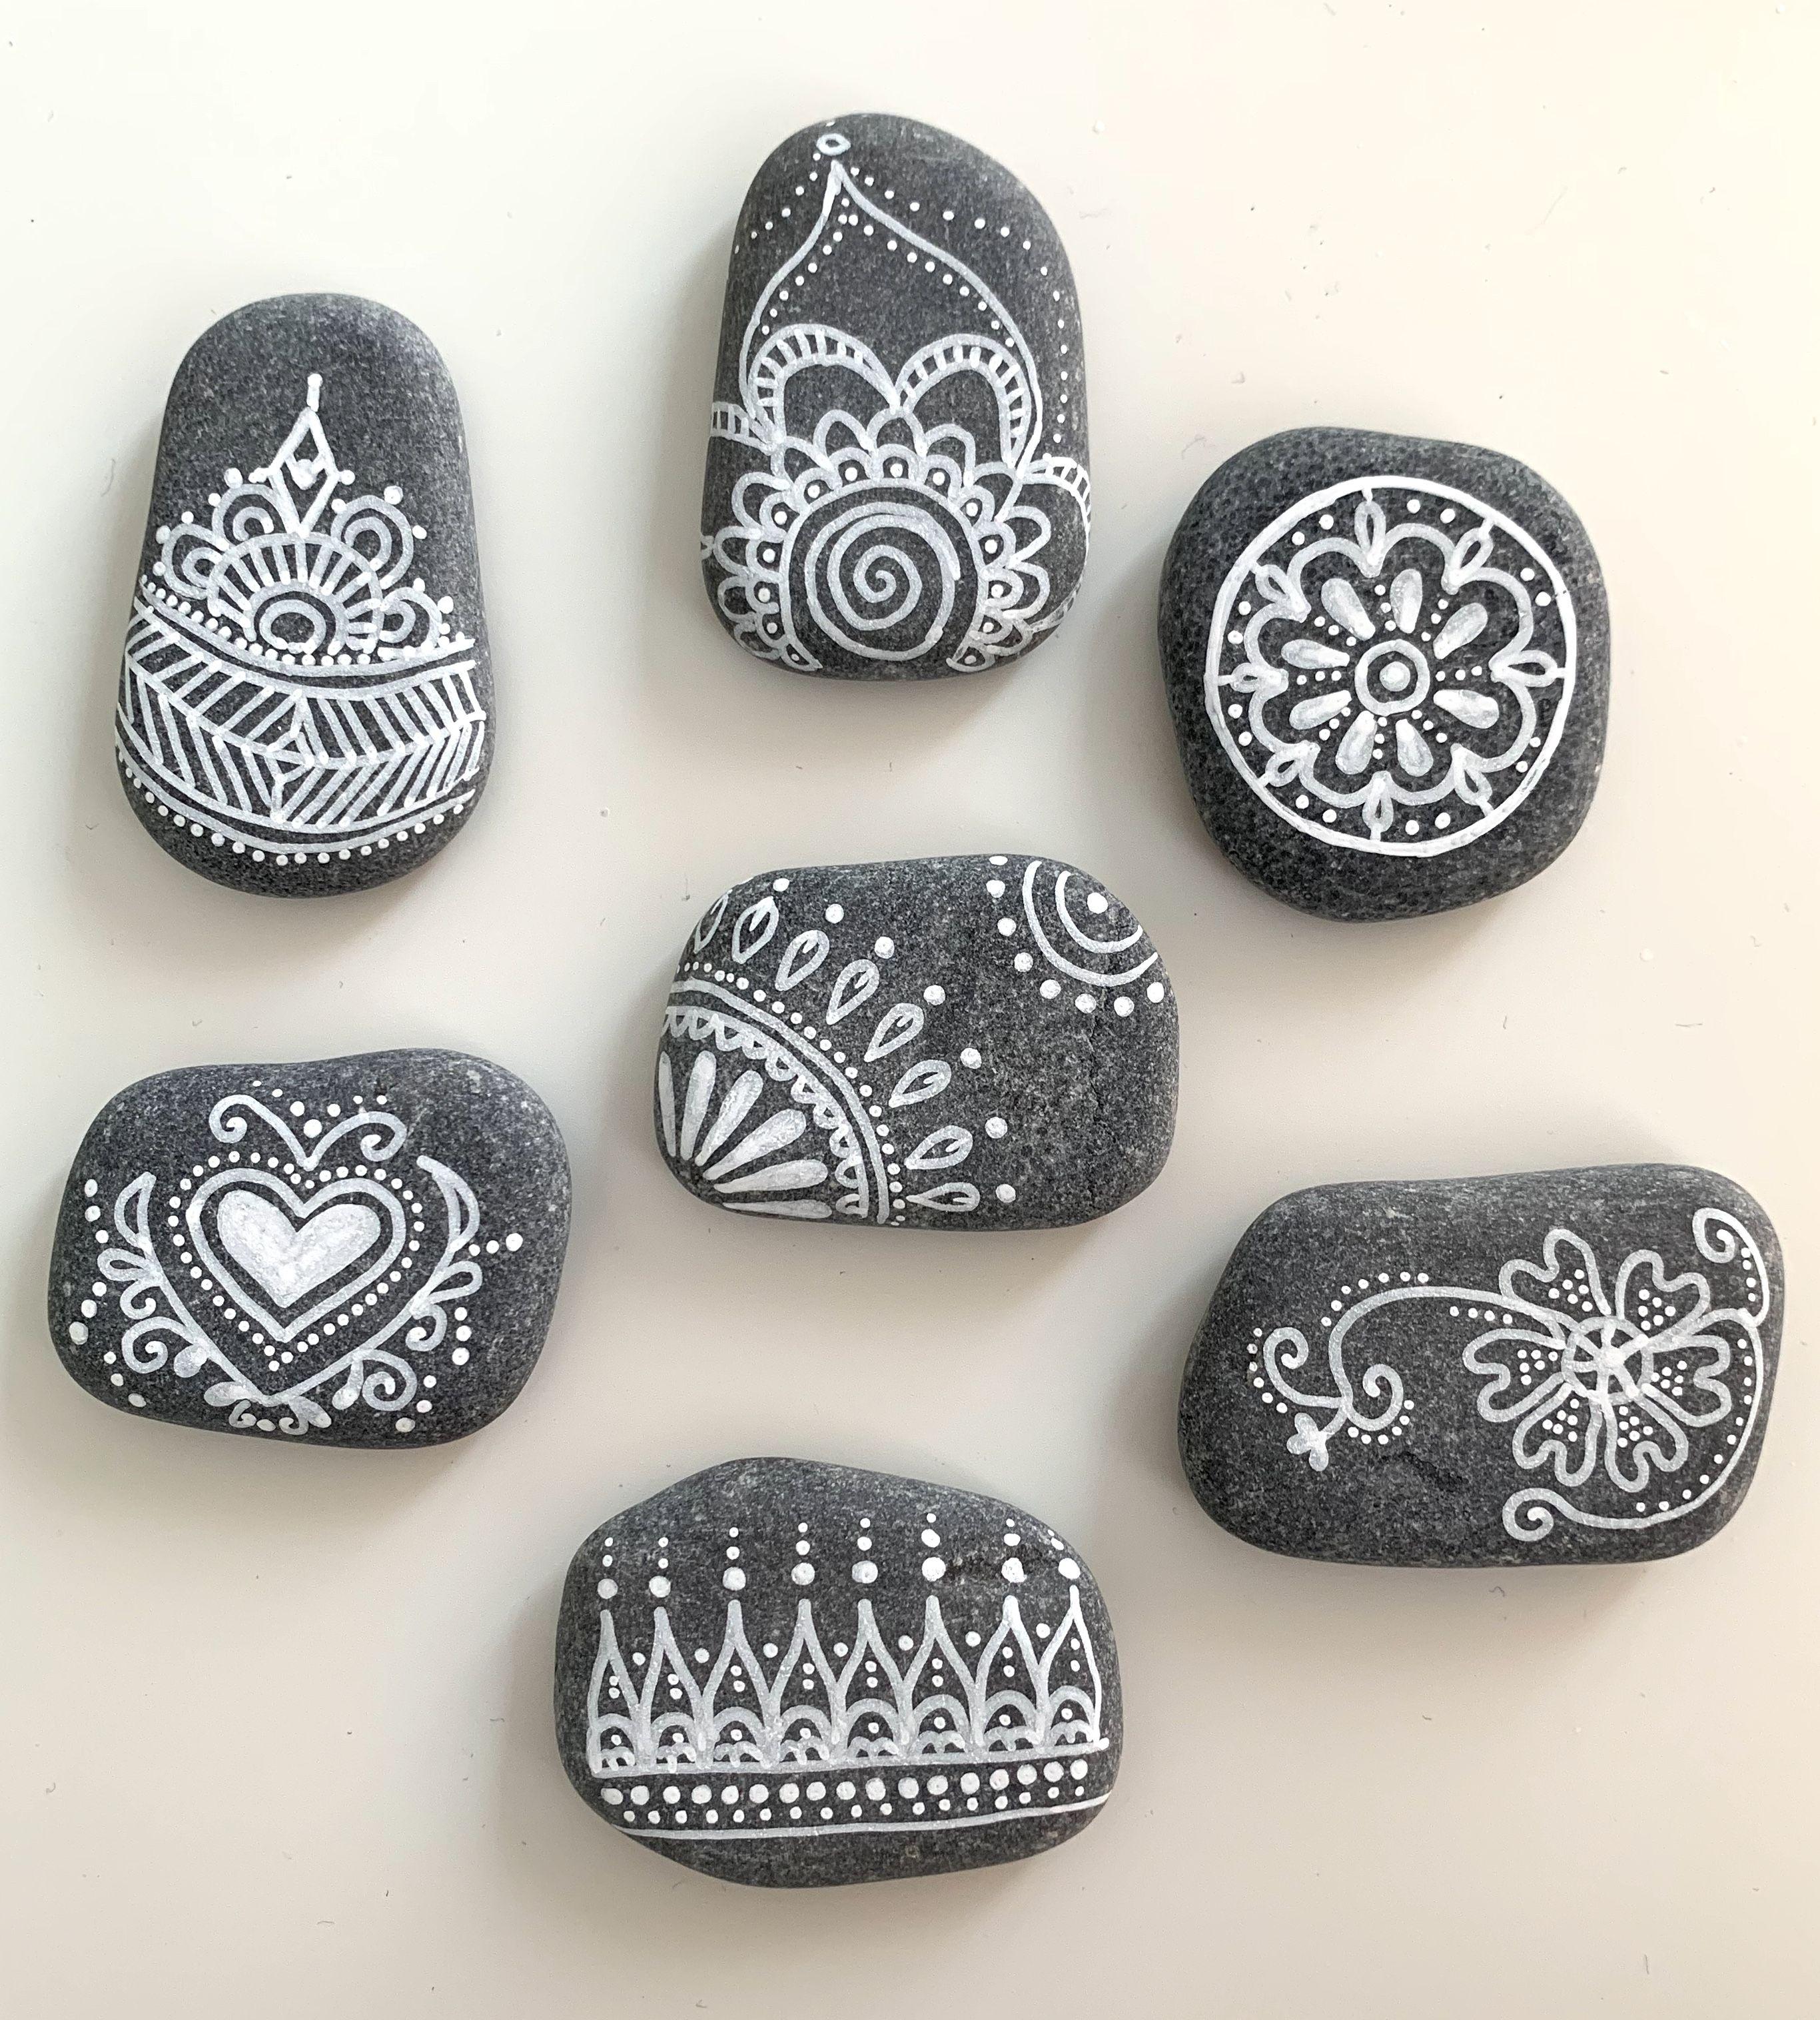 Steinmalerei - Rockart - Ornamente